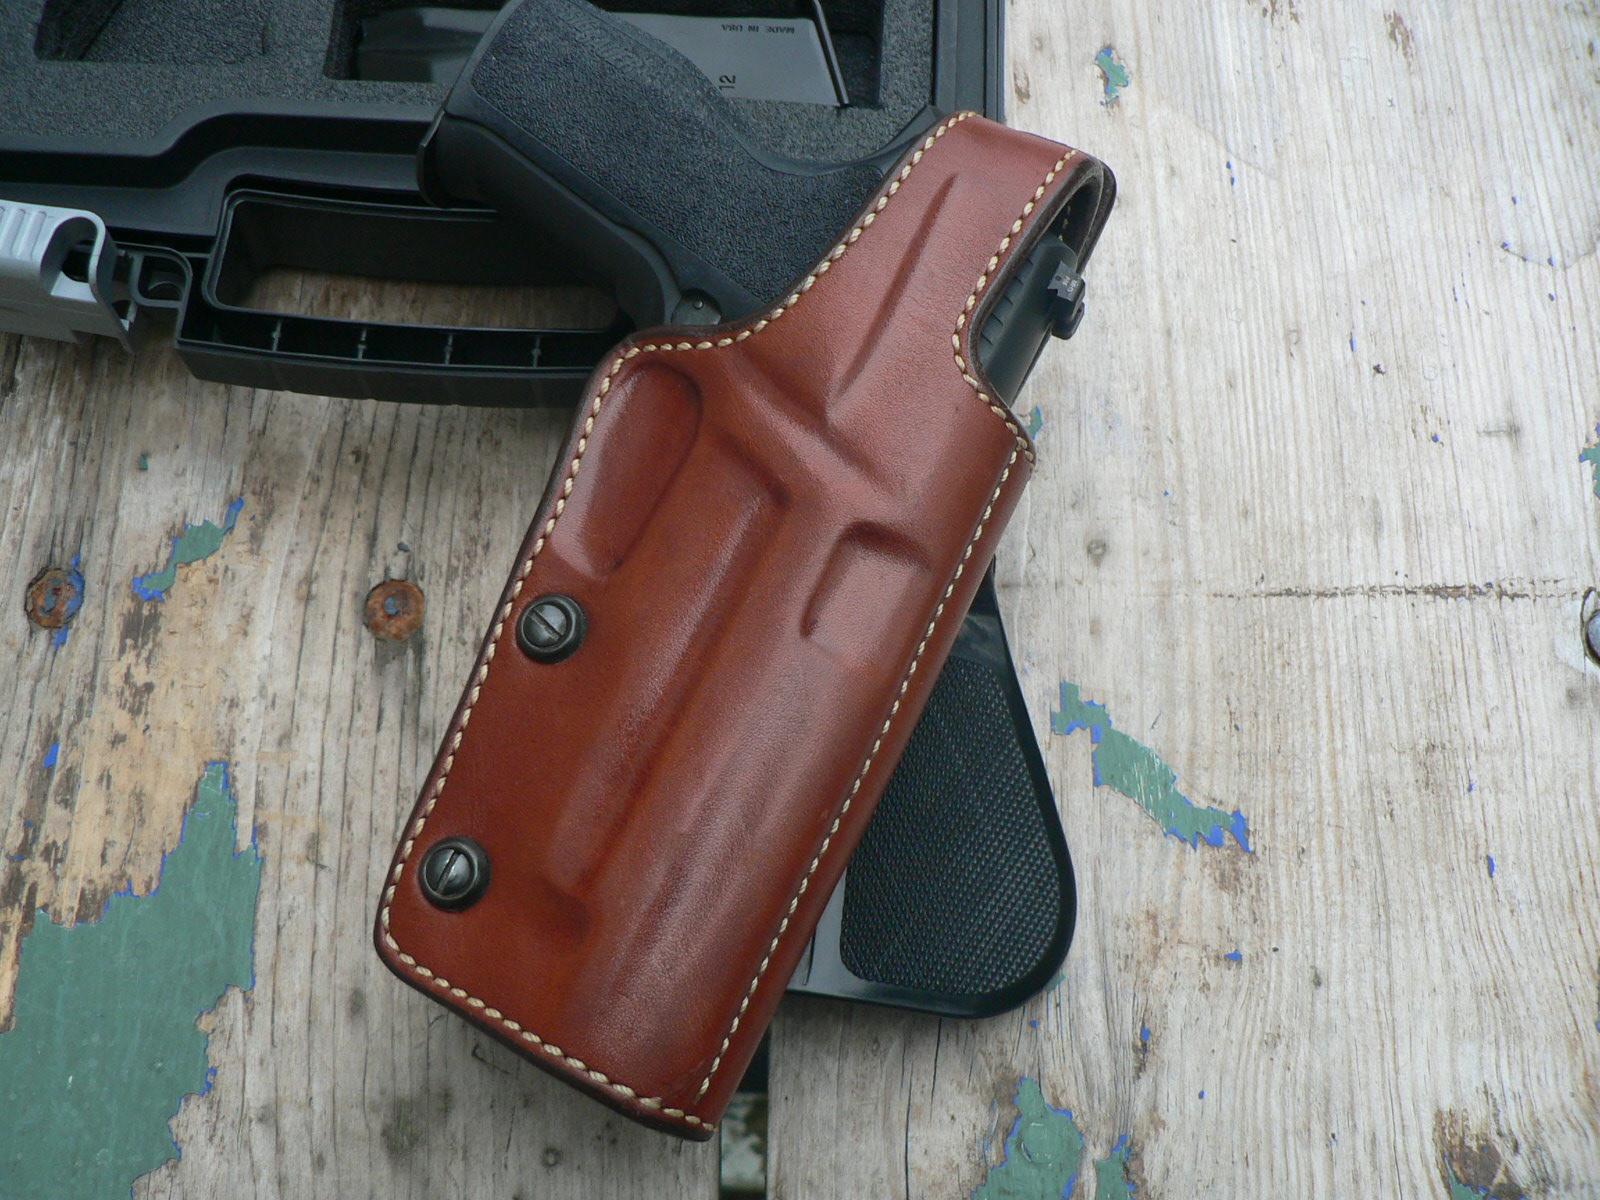 Galco paddle holster-galco-paddle-holster-001.jpg